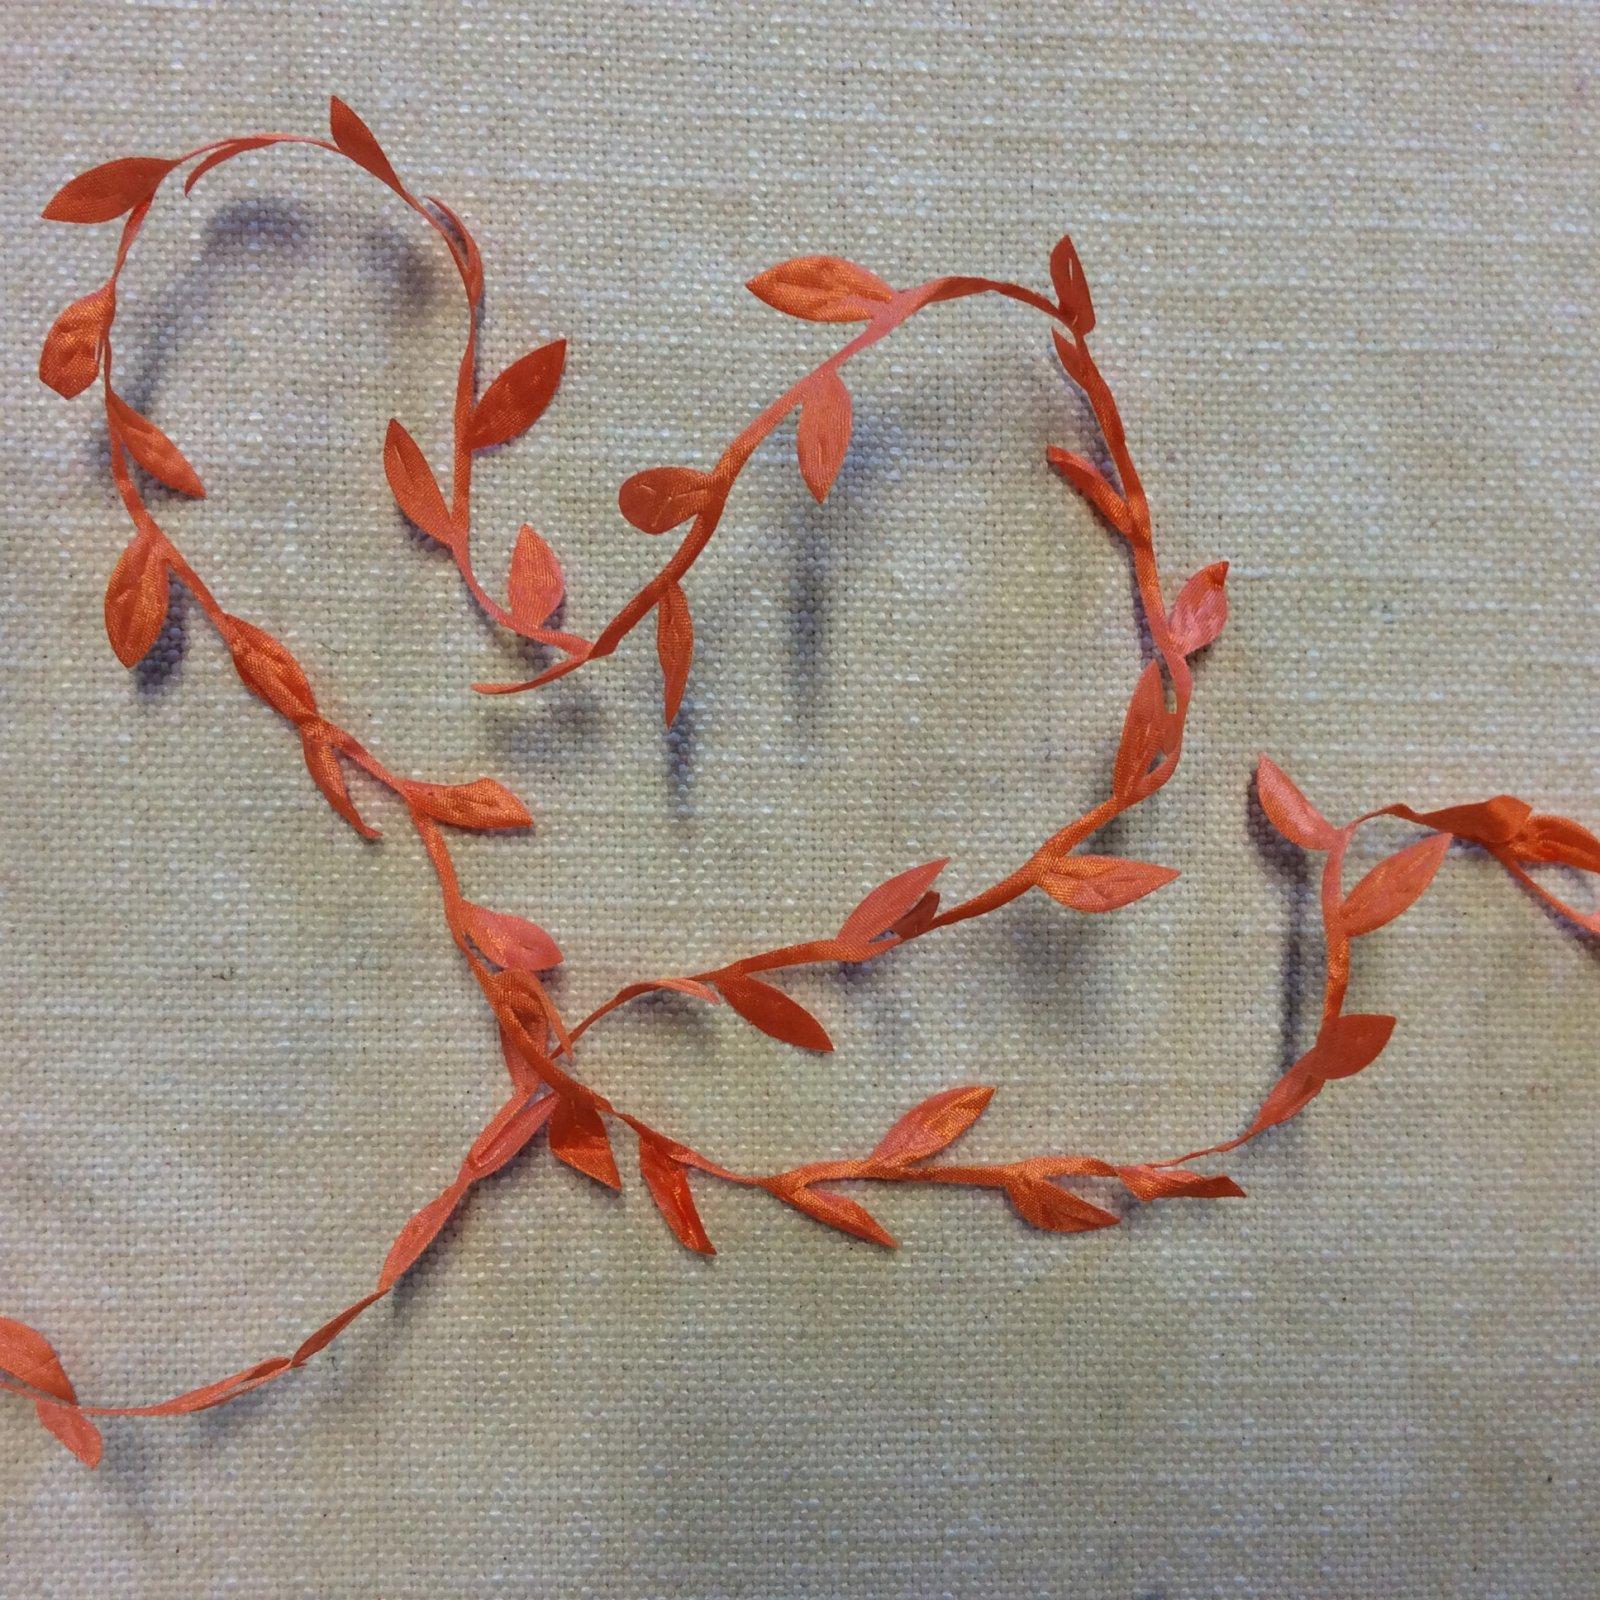 Leaf String Ribbon Orange Ribbon Apparel Trim RIB1123